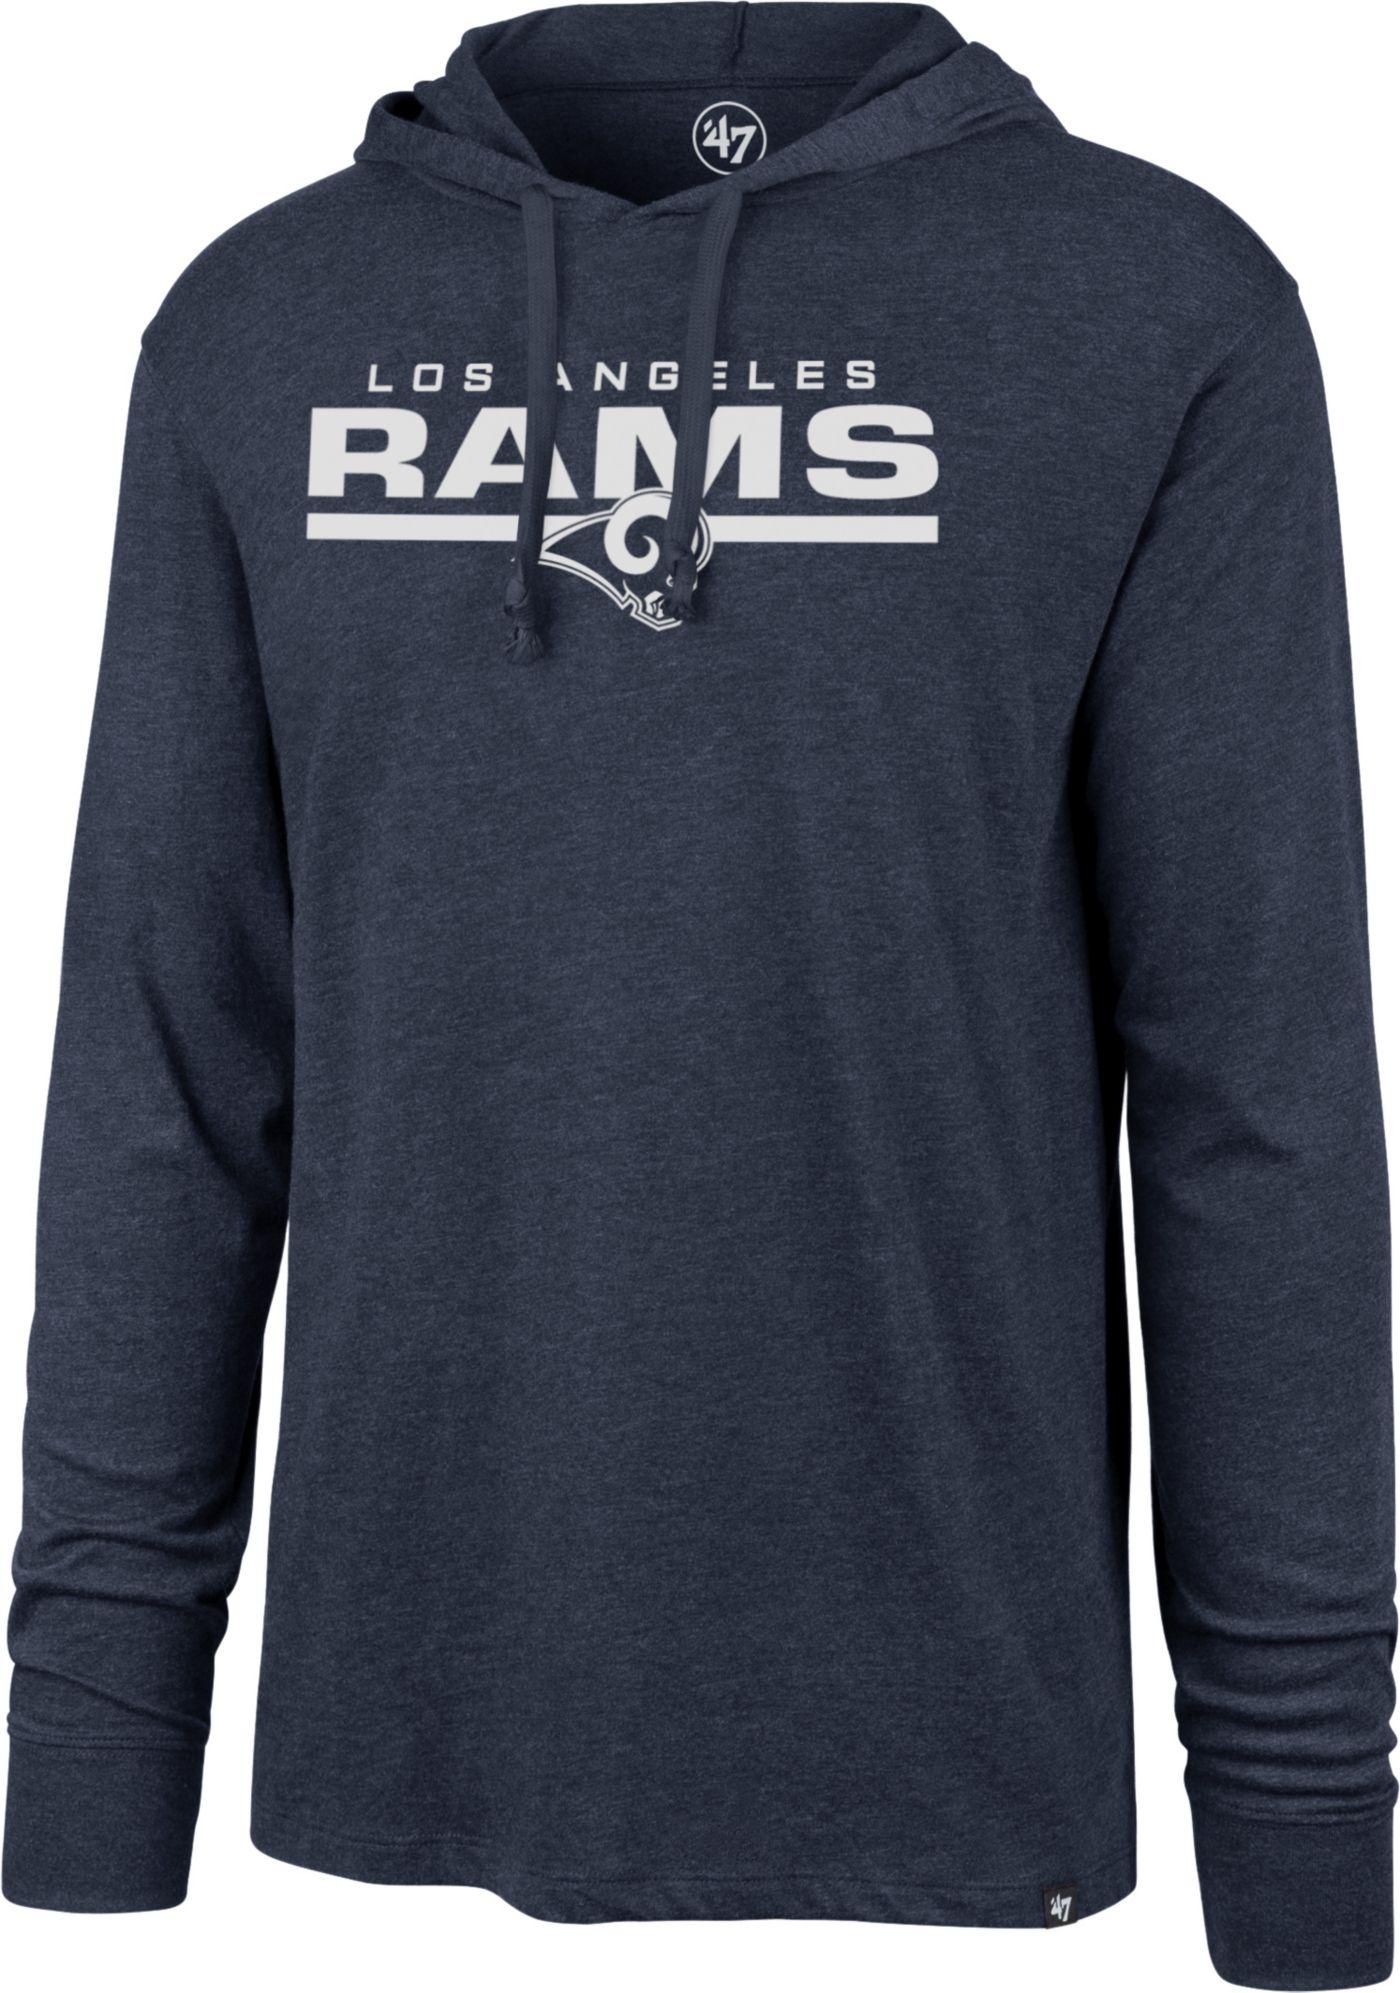 '47 Men's Los Angeles Rams Club Navy Hooded Long Sleeve Shirt